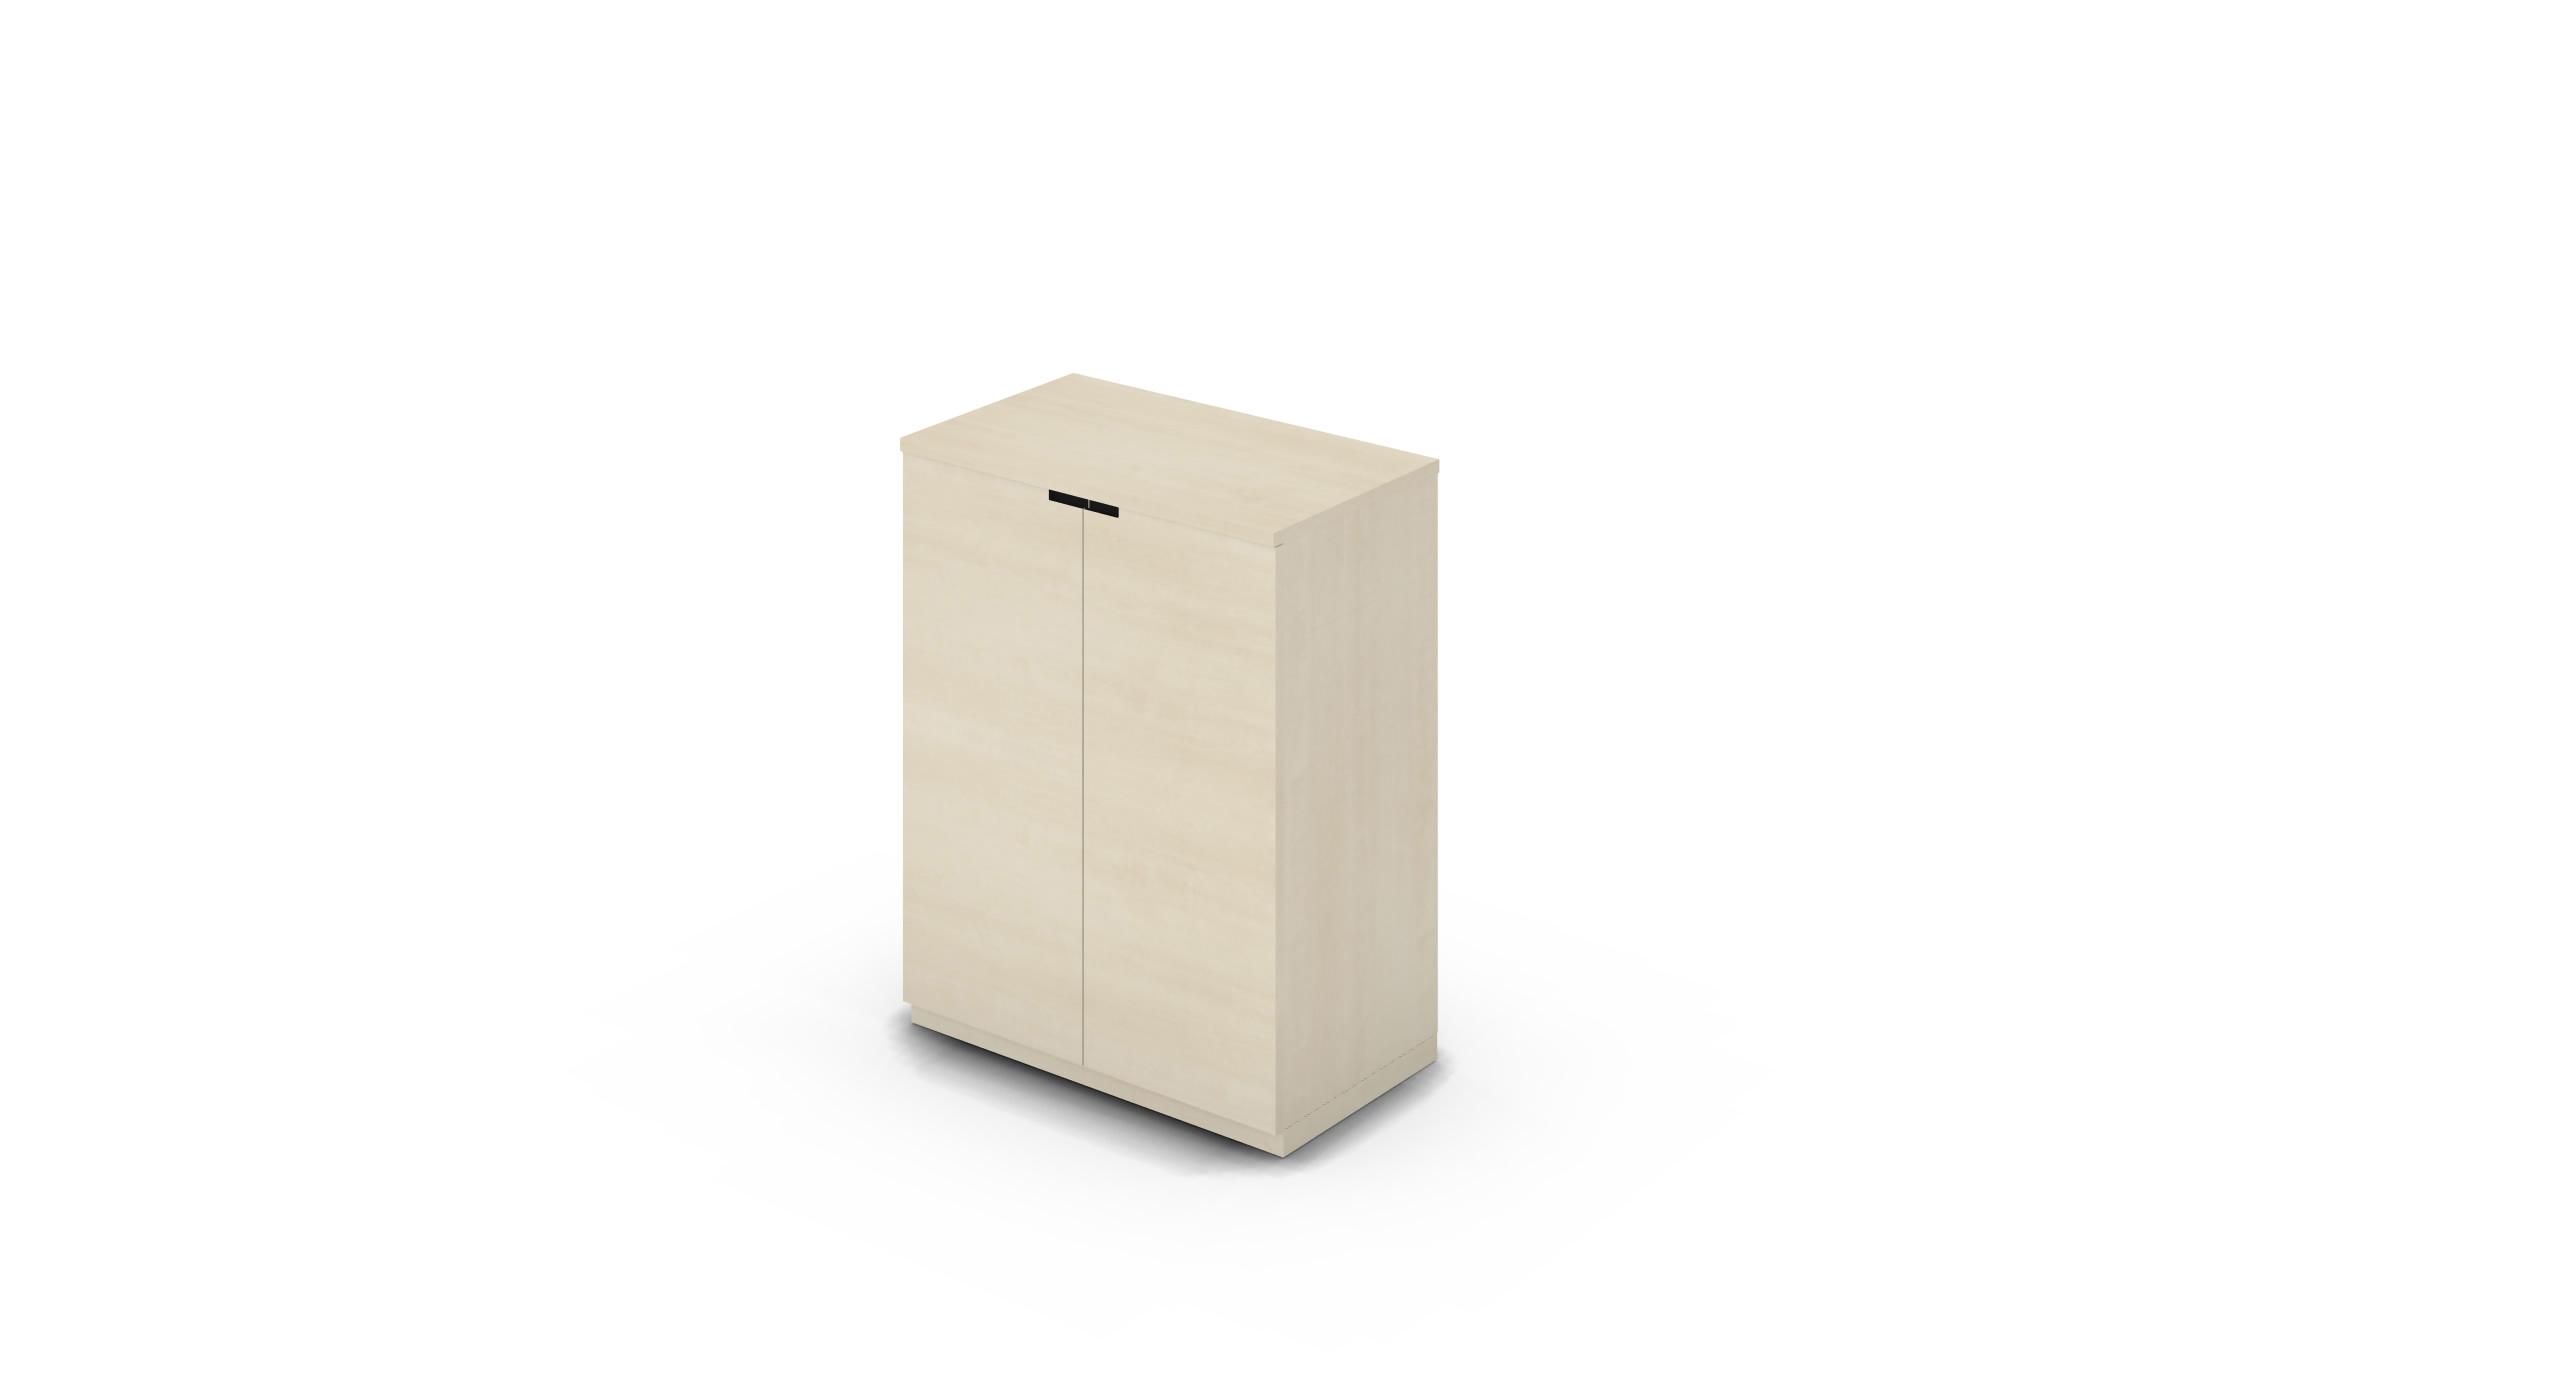 Cabinet_800x450x1125_HD_Maple_CutOut_NoCylinder